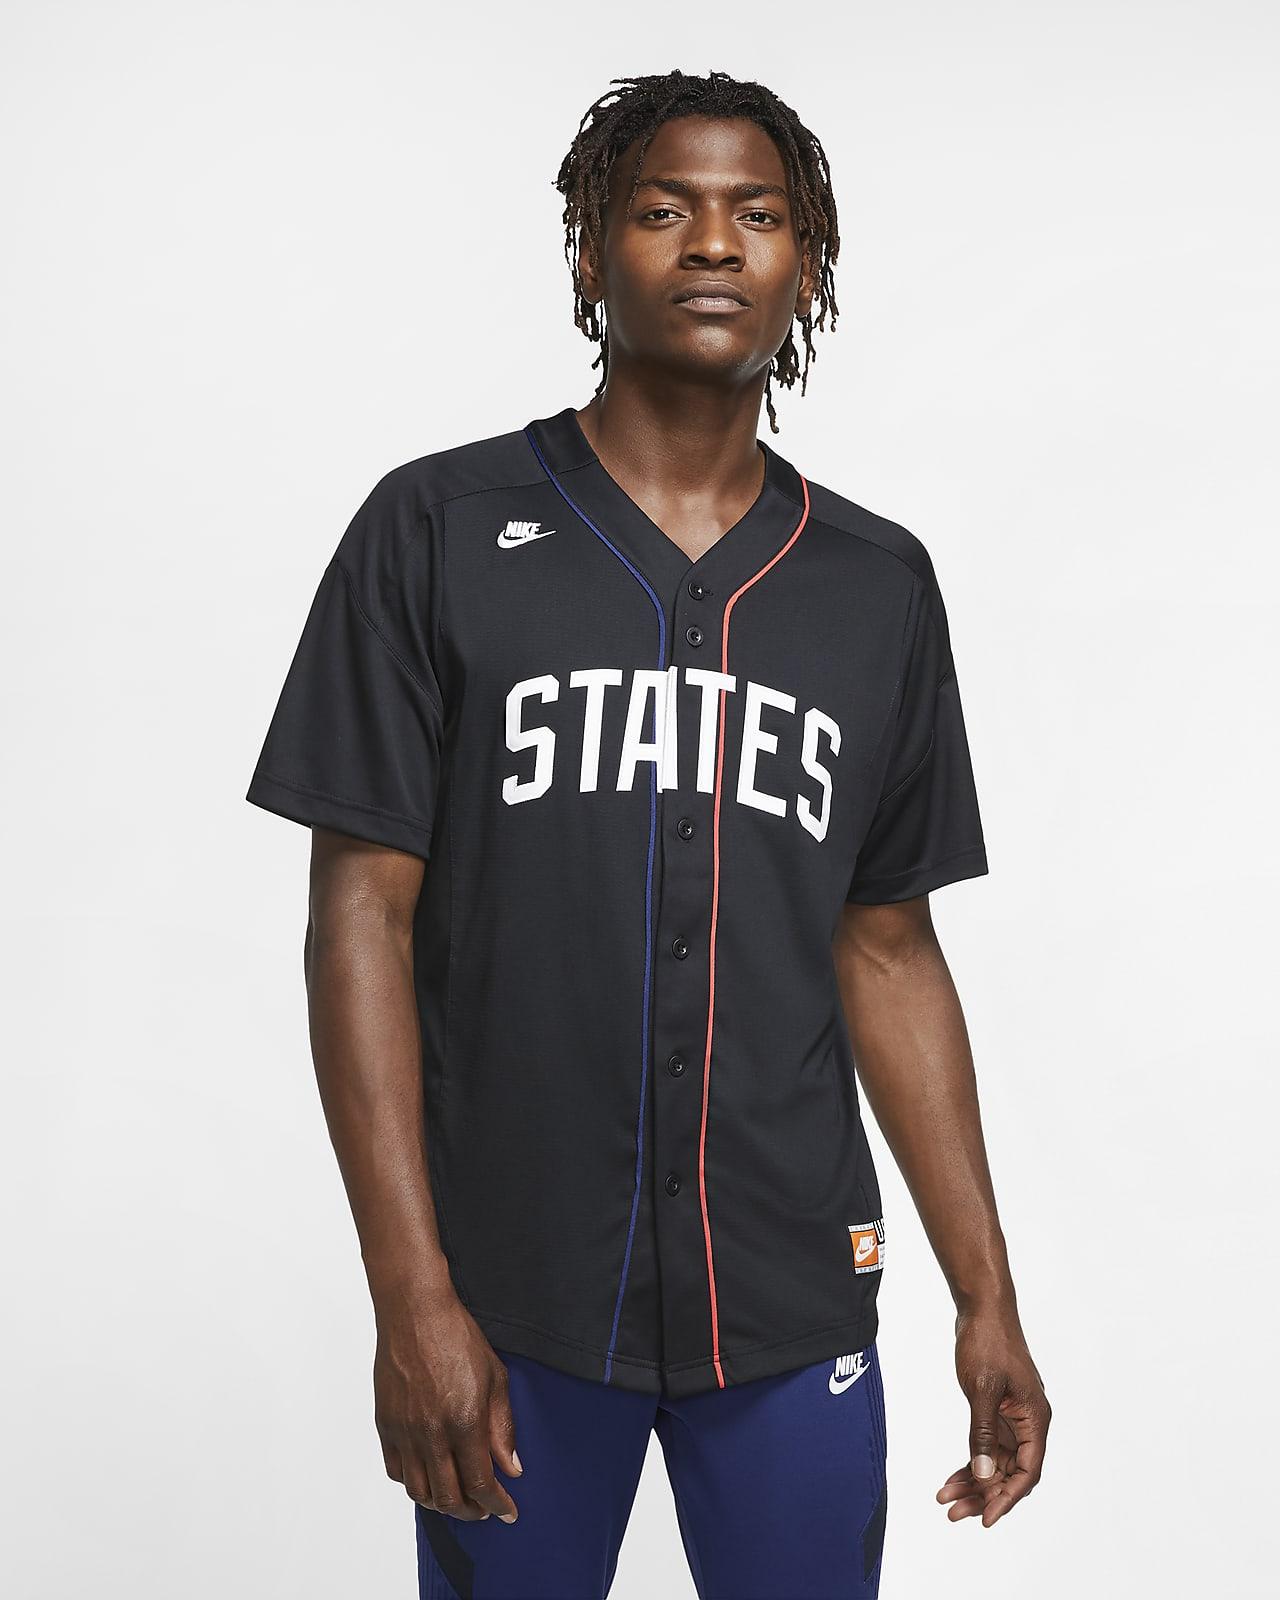 Galaxia Descriptivo fingir  U.S. Men's Baseball Jersey. Nike.com